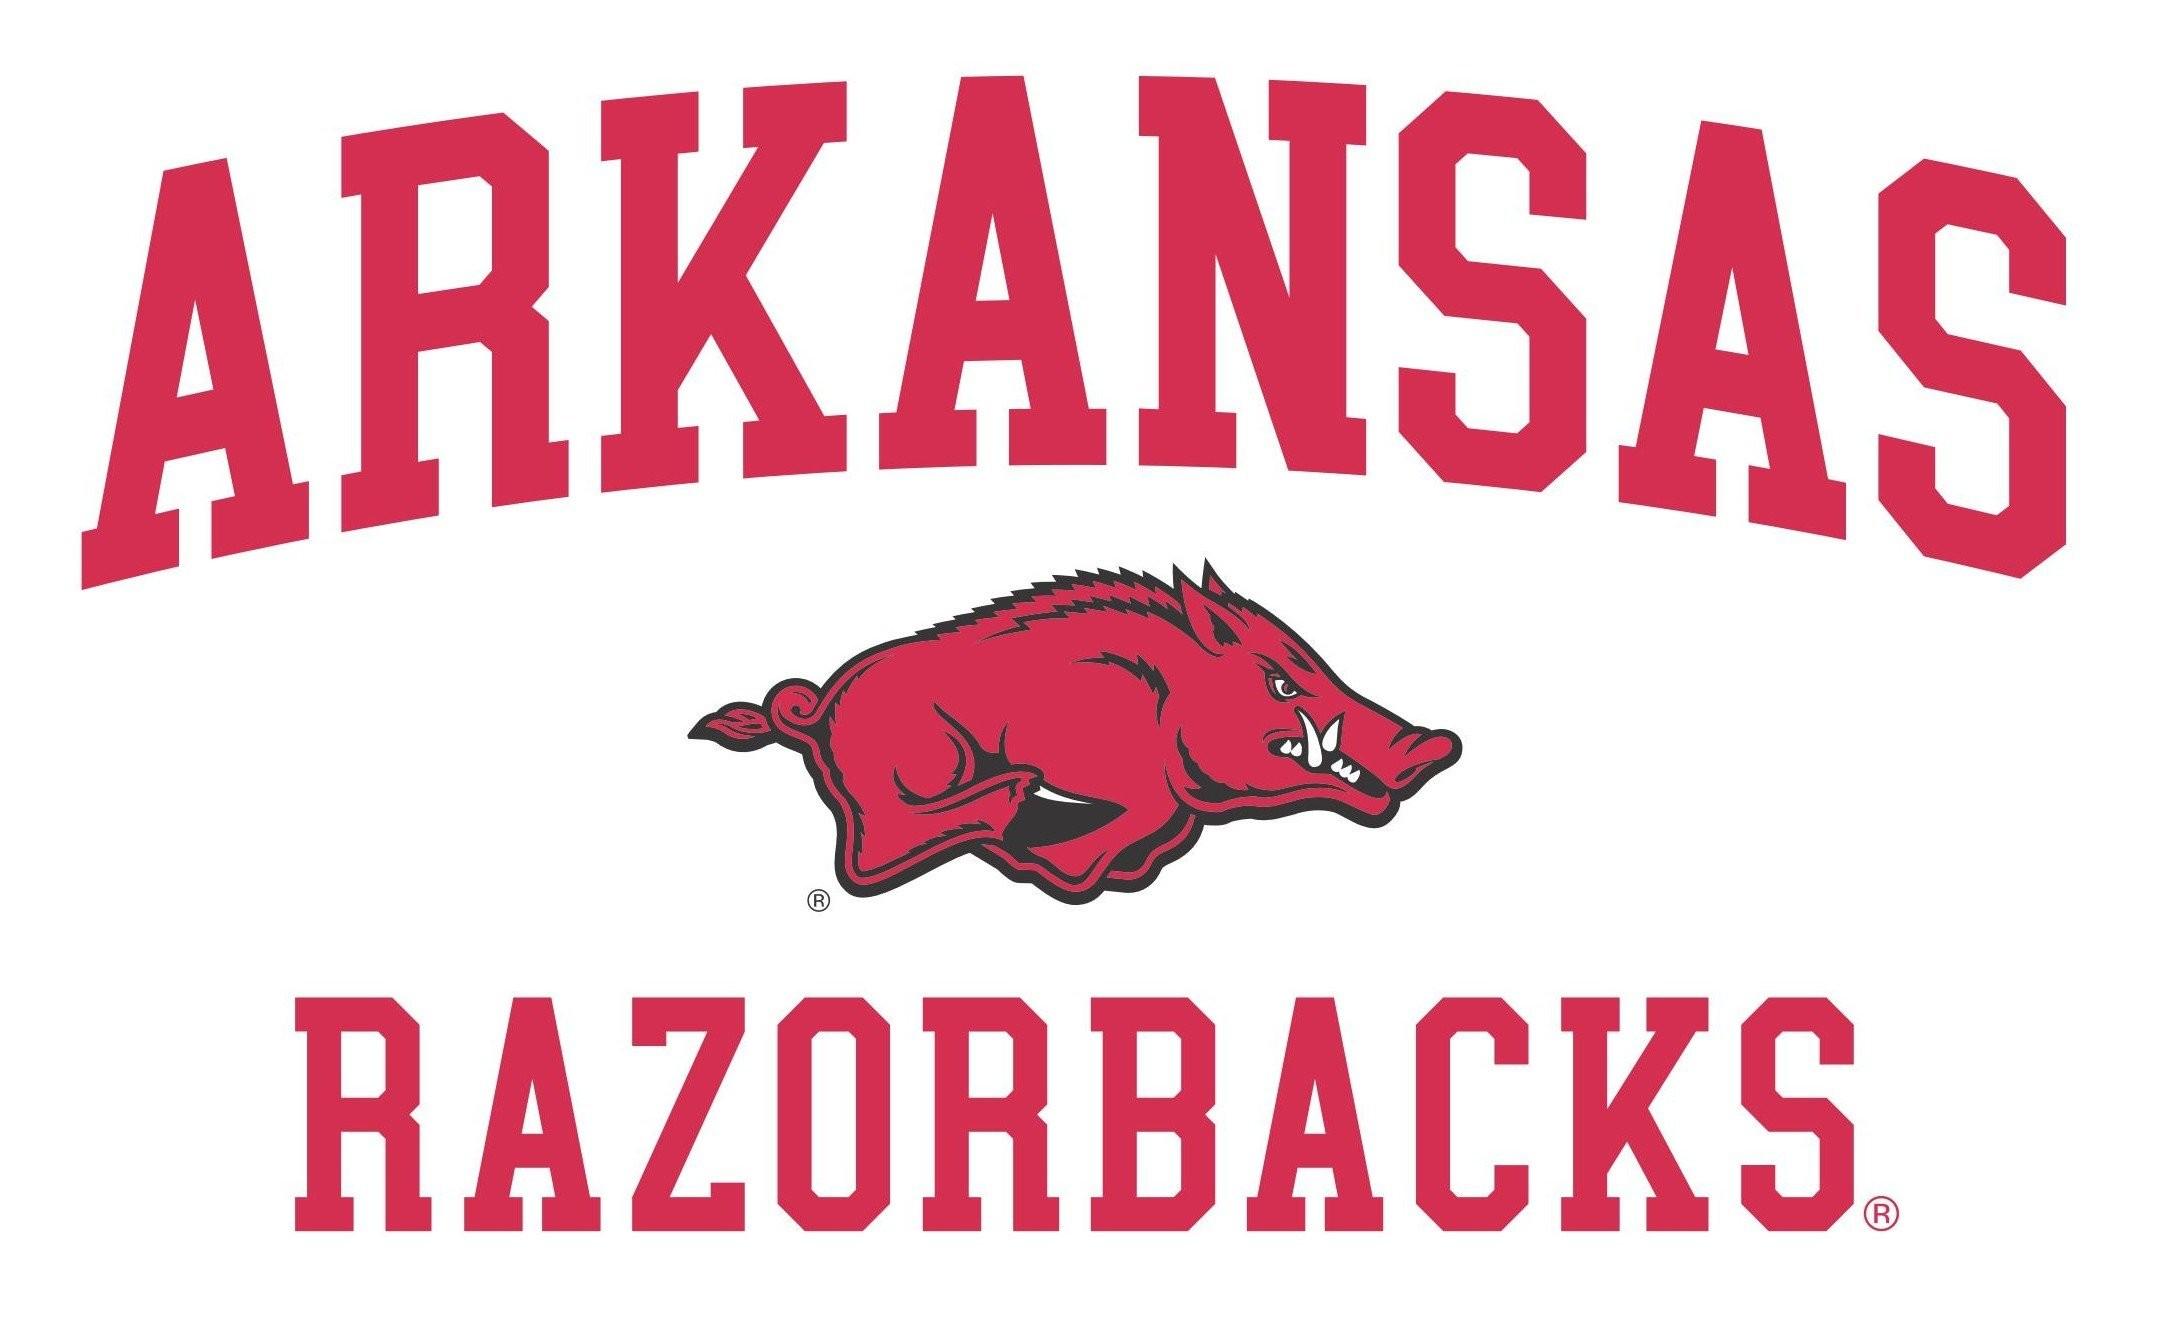 Arkansas Razorbacks Football 2015-16 // Strive For Greatness – YouTube